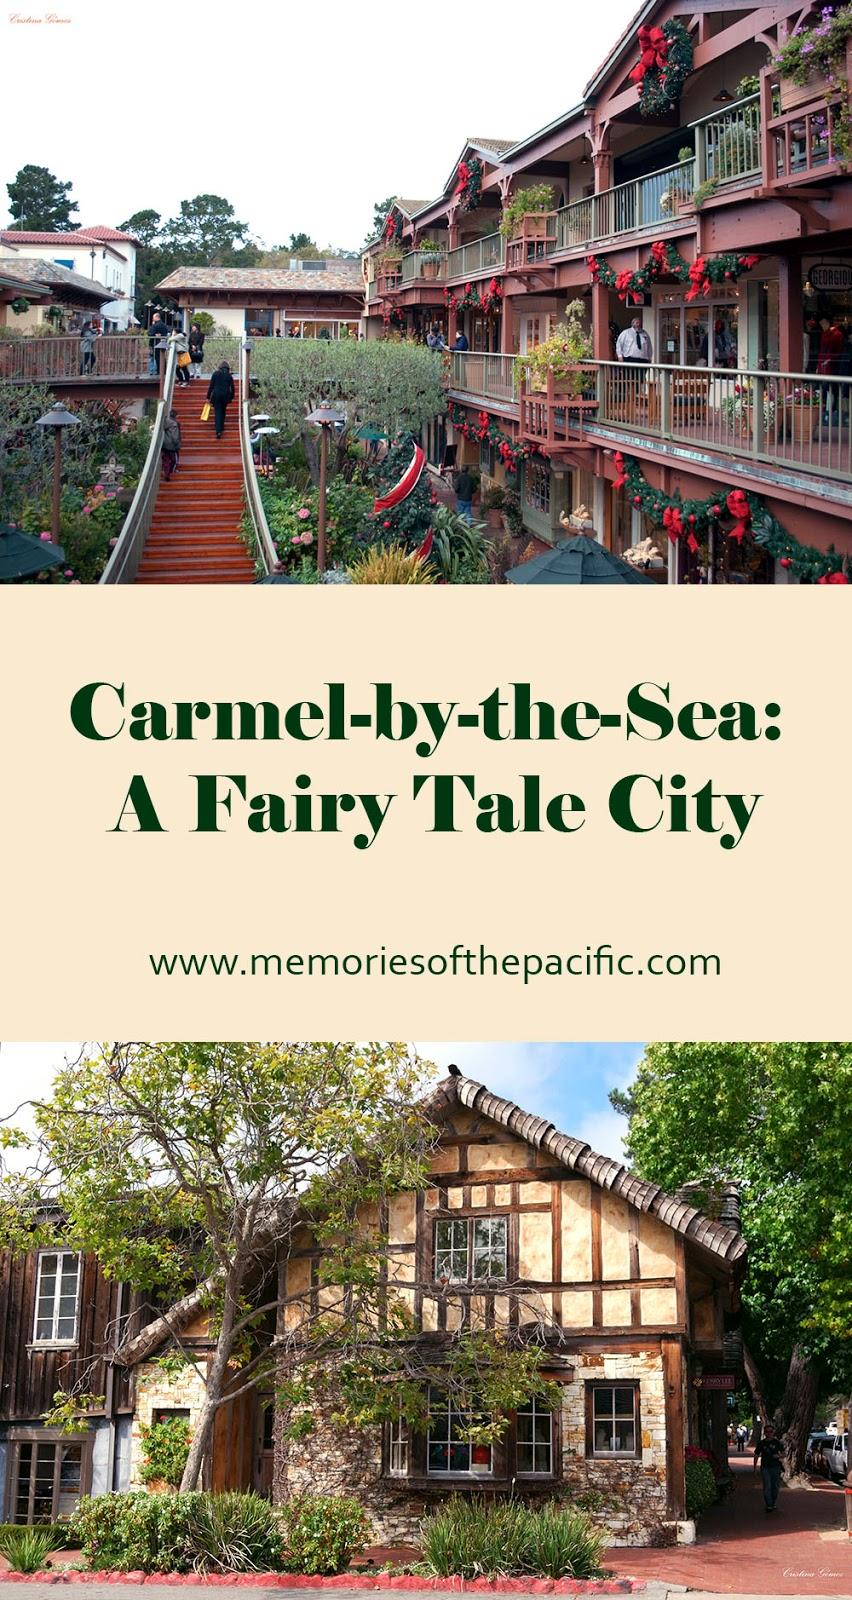 carmel downtown houses fairytale california seaside charming town pinterest pinneable